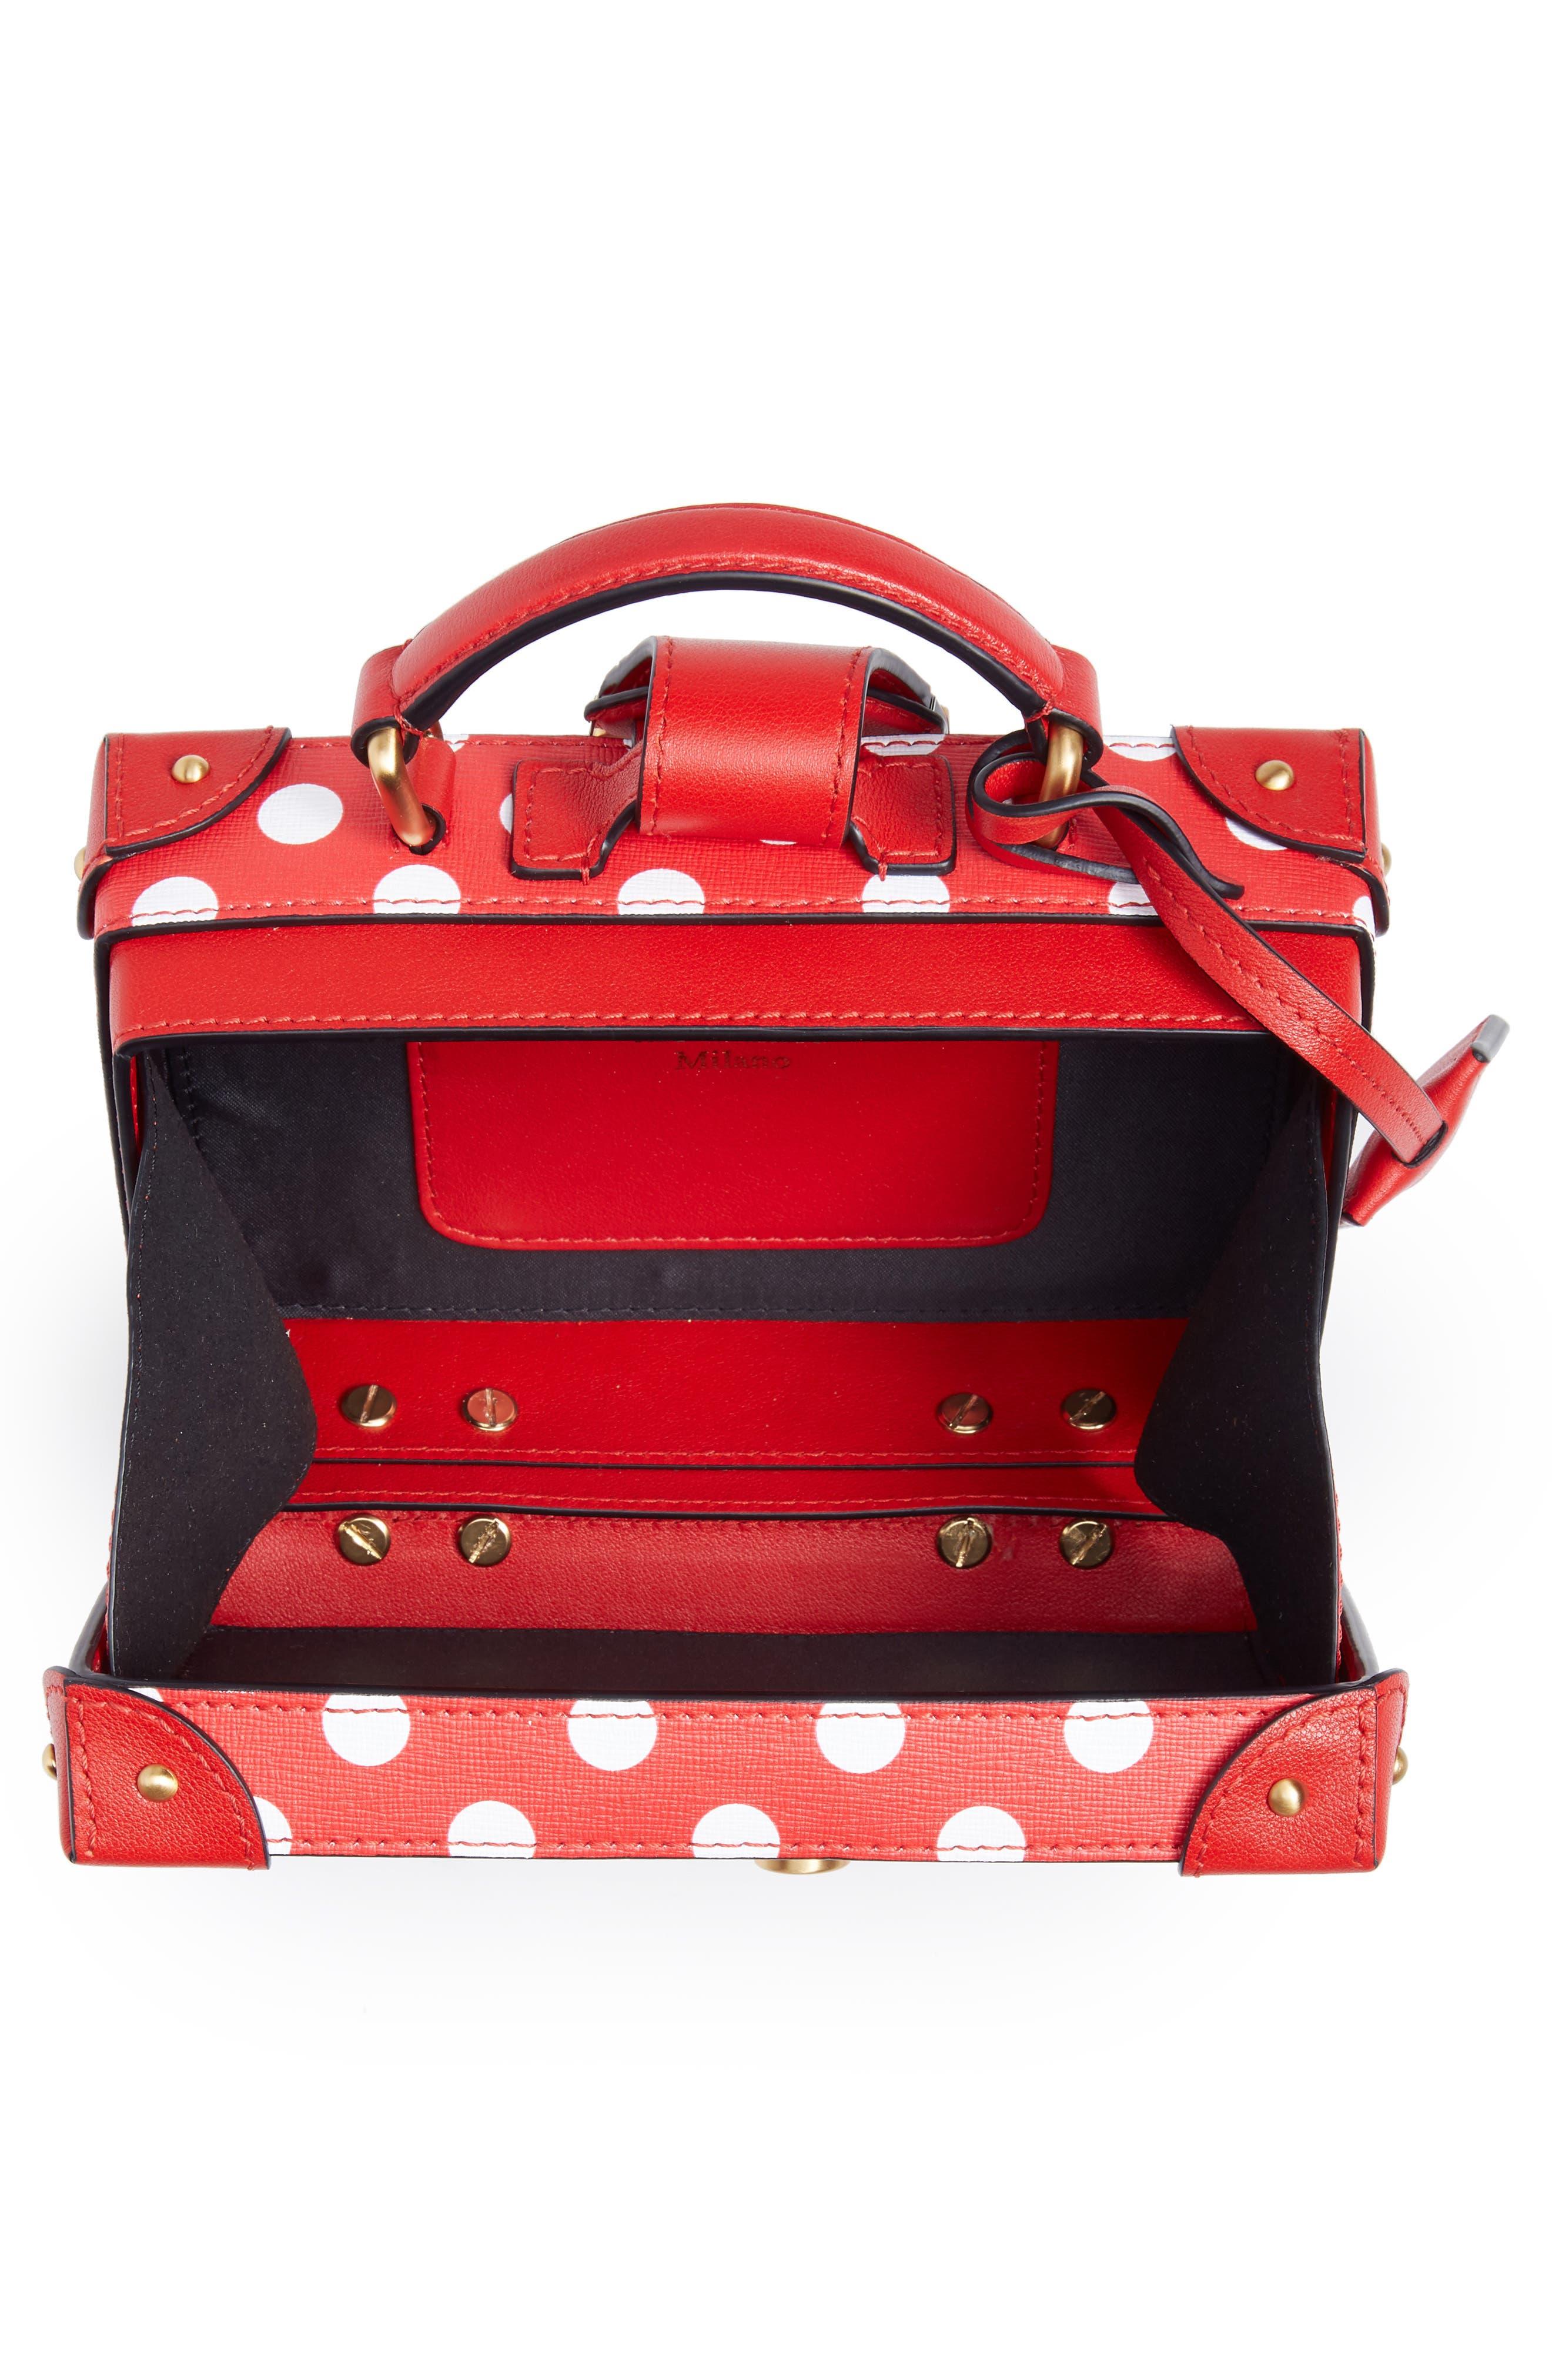 MOSCHINO, Polka Dot Box Leather Crossbody Bag, Alternate thumbnail 4, color, RED